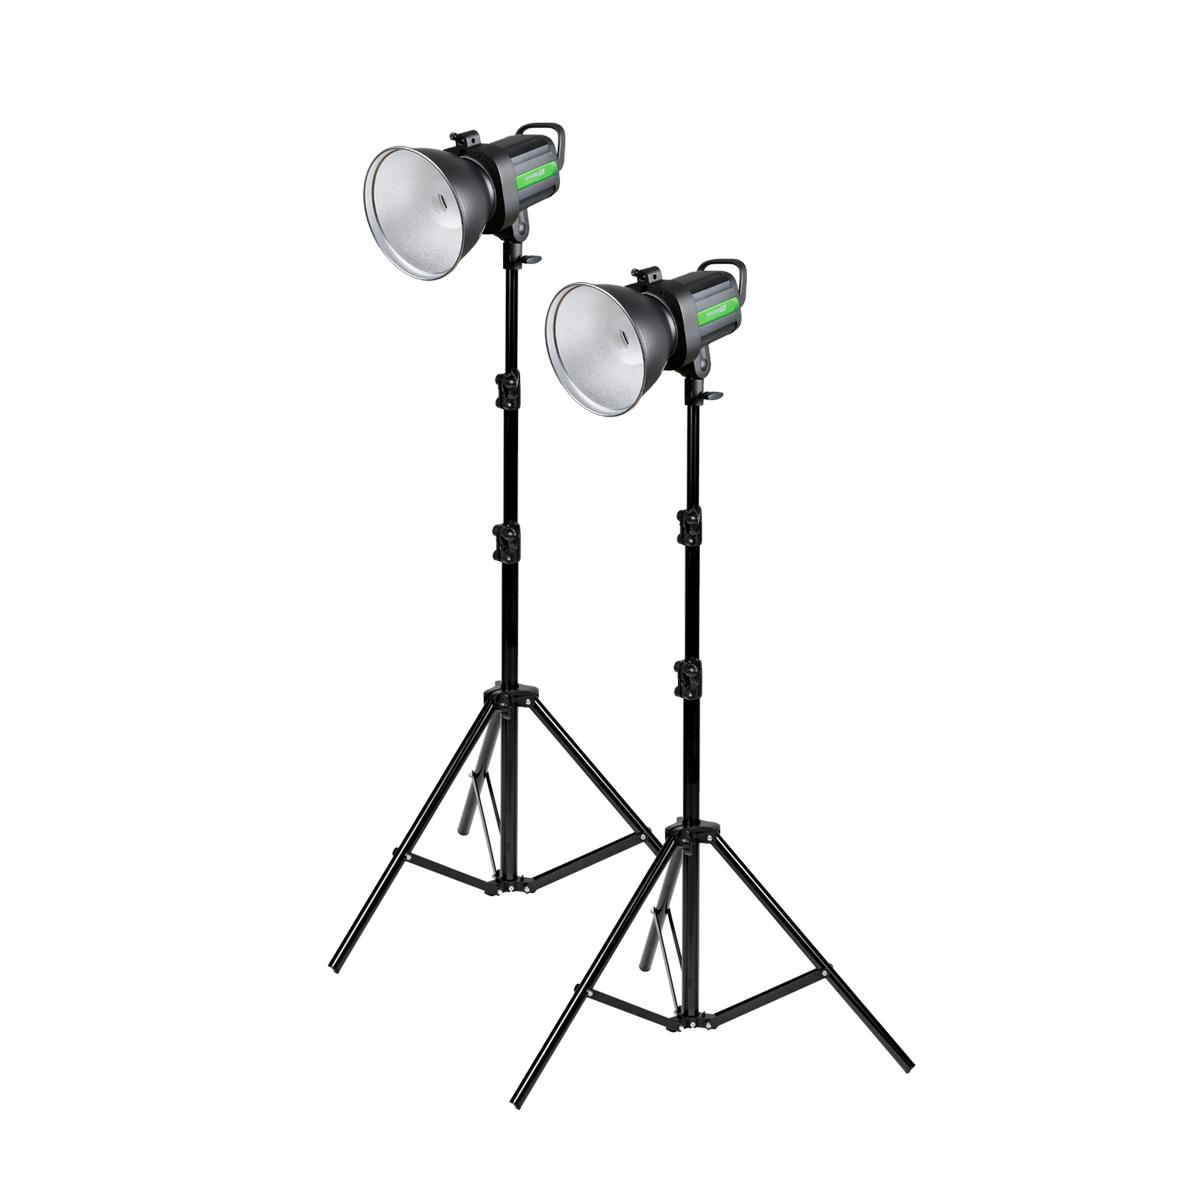 Phottix Indra500 TTL 2-Light Kit – The Camera Exchange, Inc.